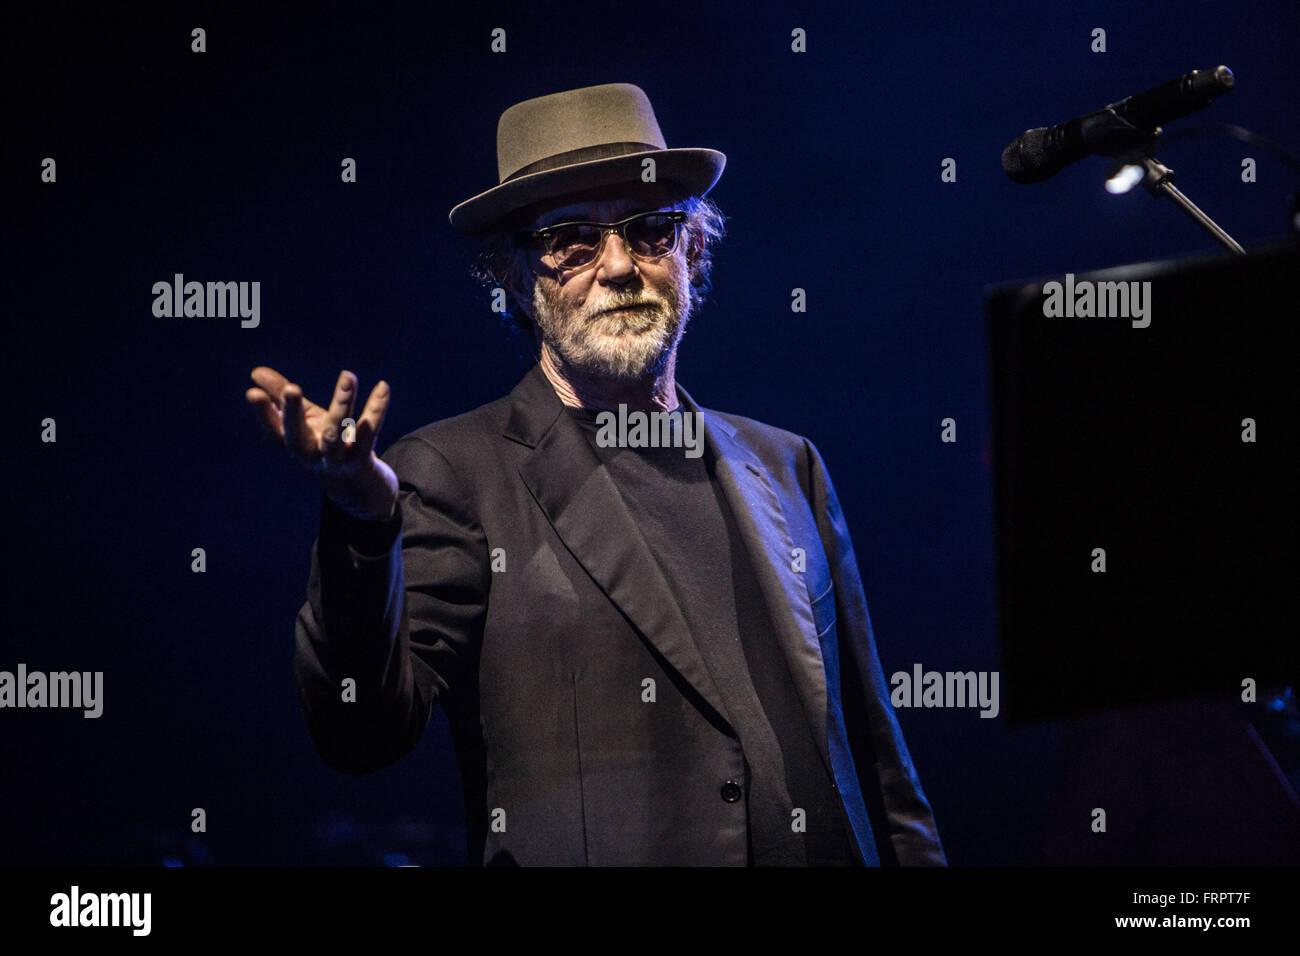 Milan, Italy. 23rd Mar, 2016. Francesco De Gregori performs live at Alcatraz in Milano, Italy, on March 23 2016 Stock Photo